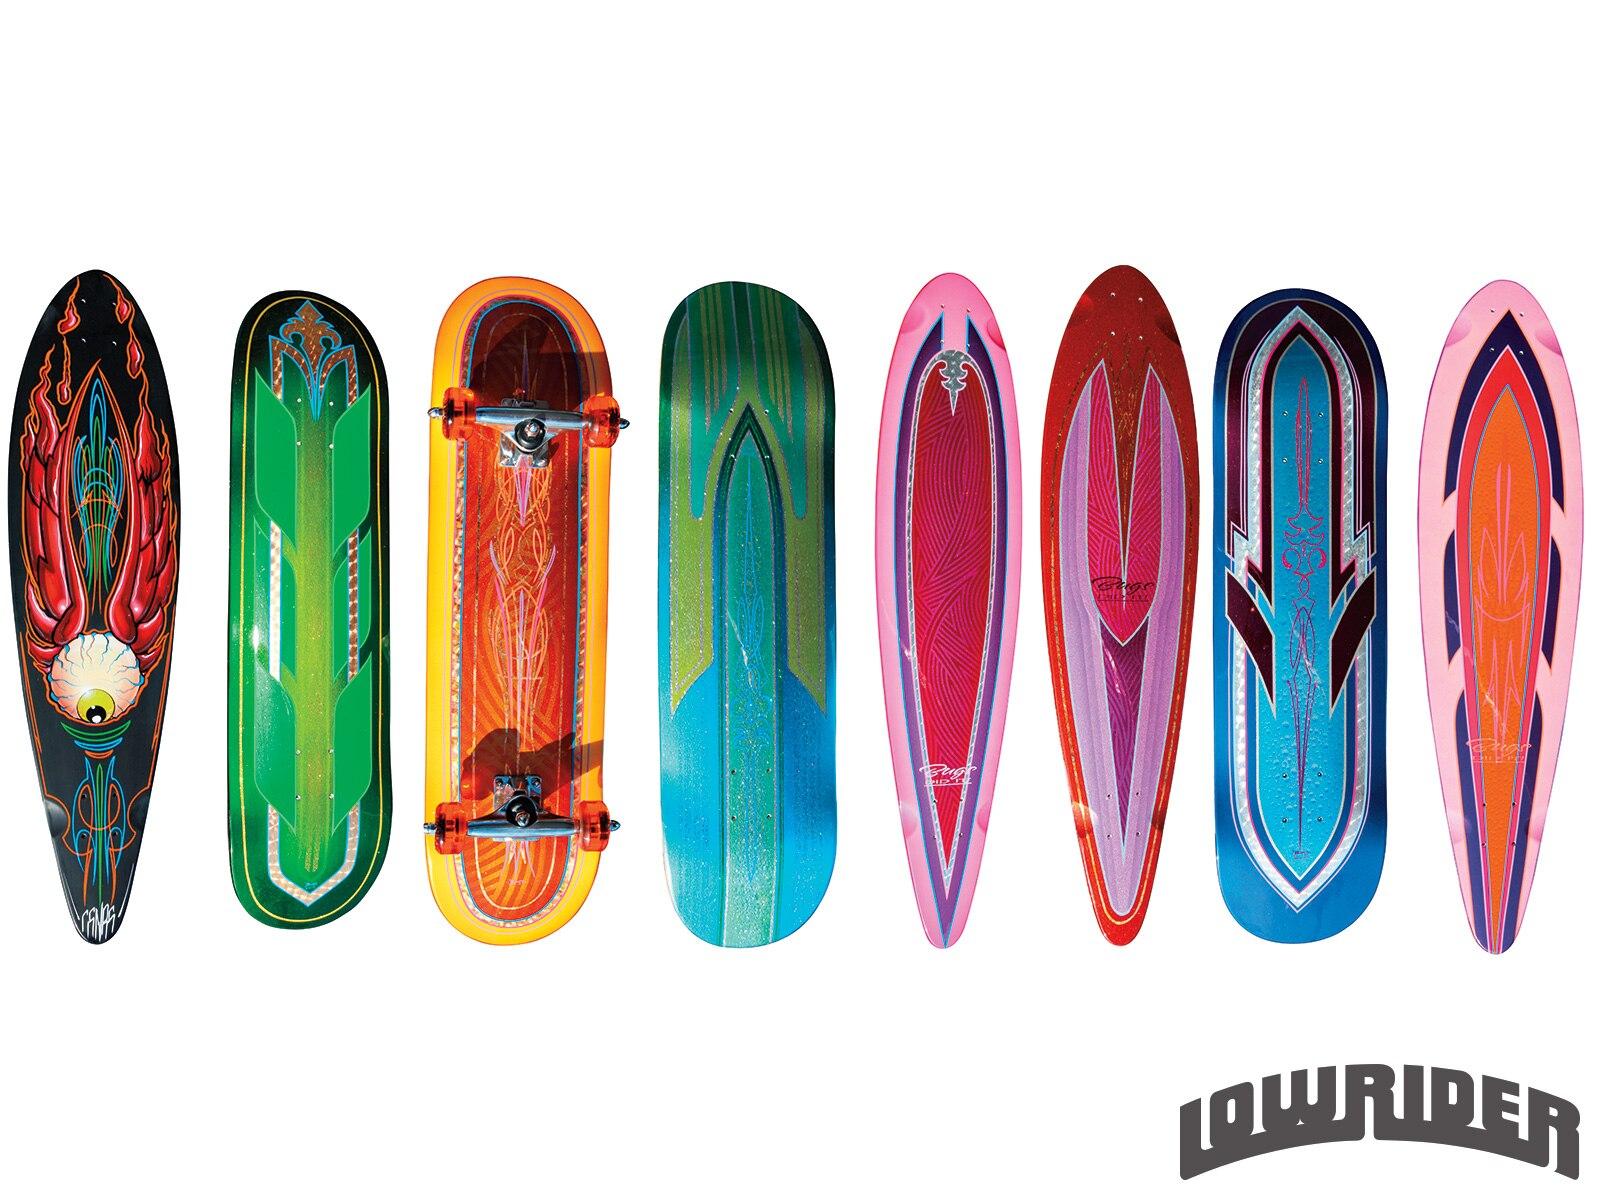 custom-painted-skateboards-bugs-designs-promo